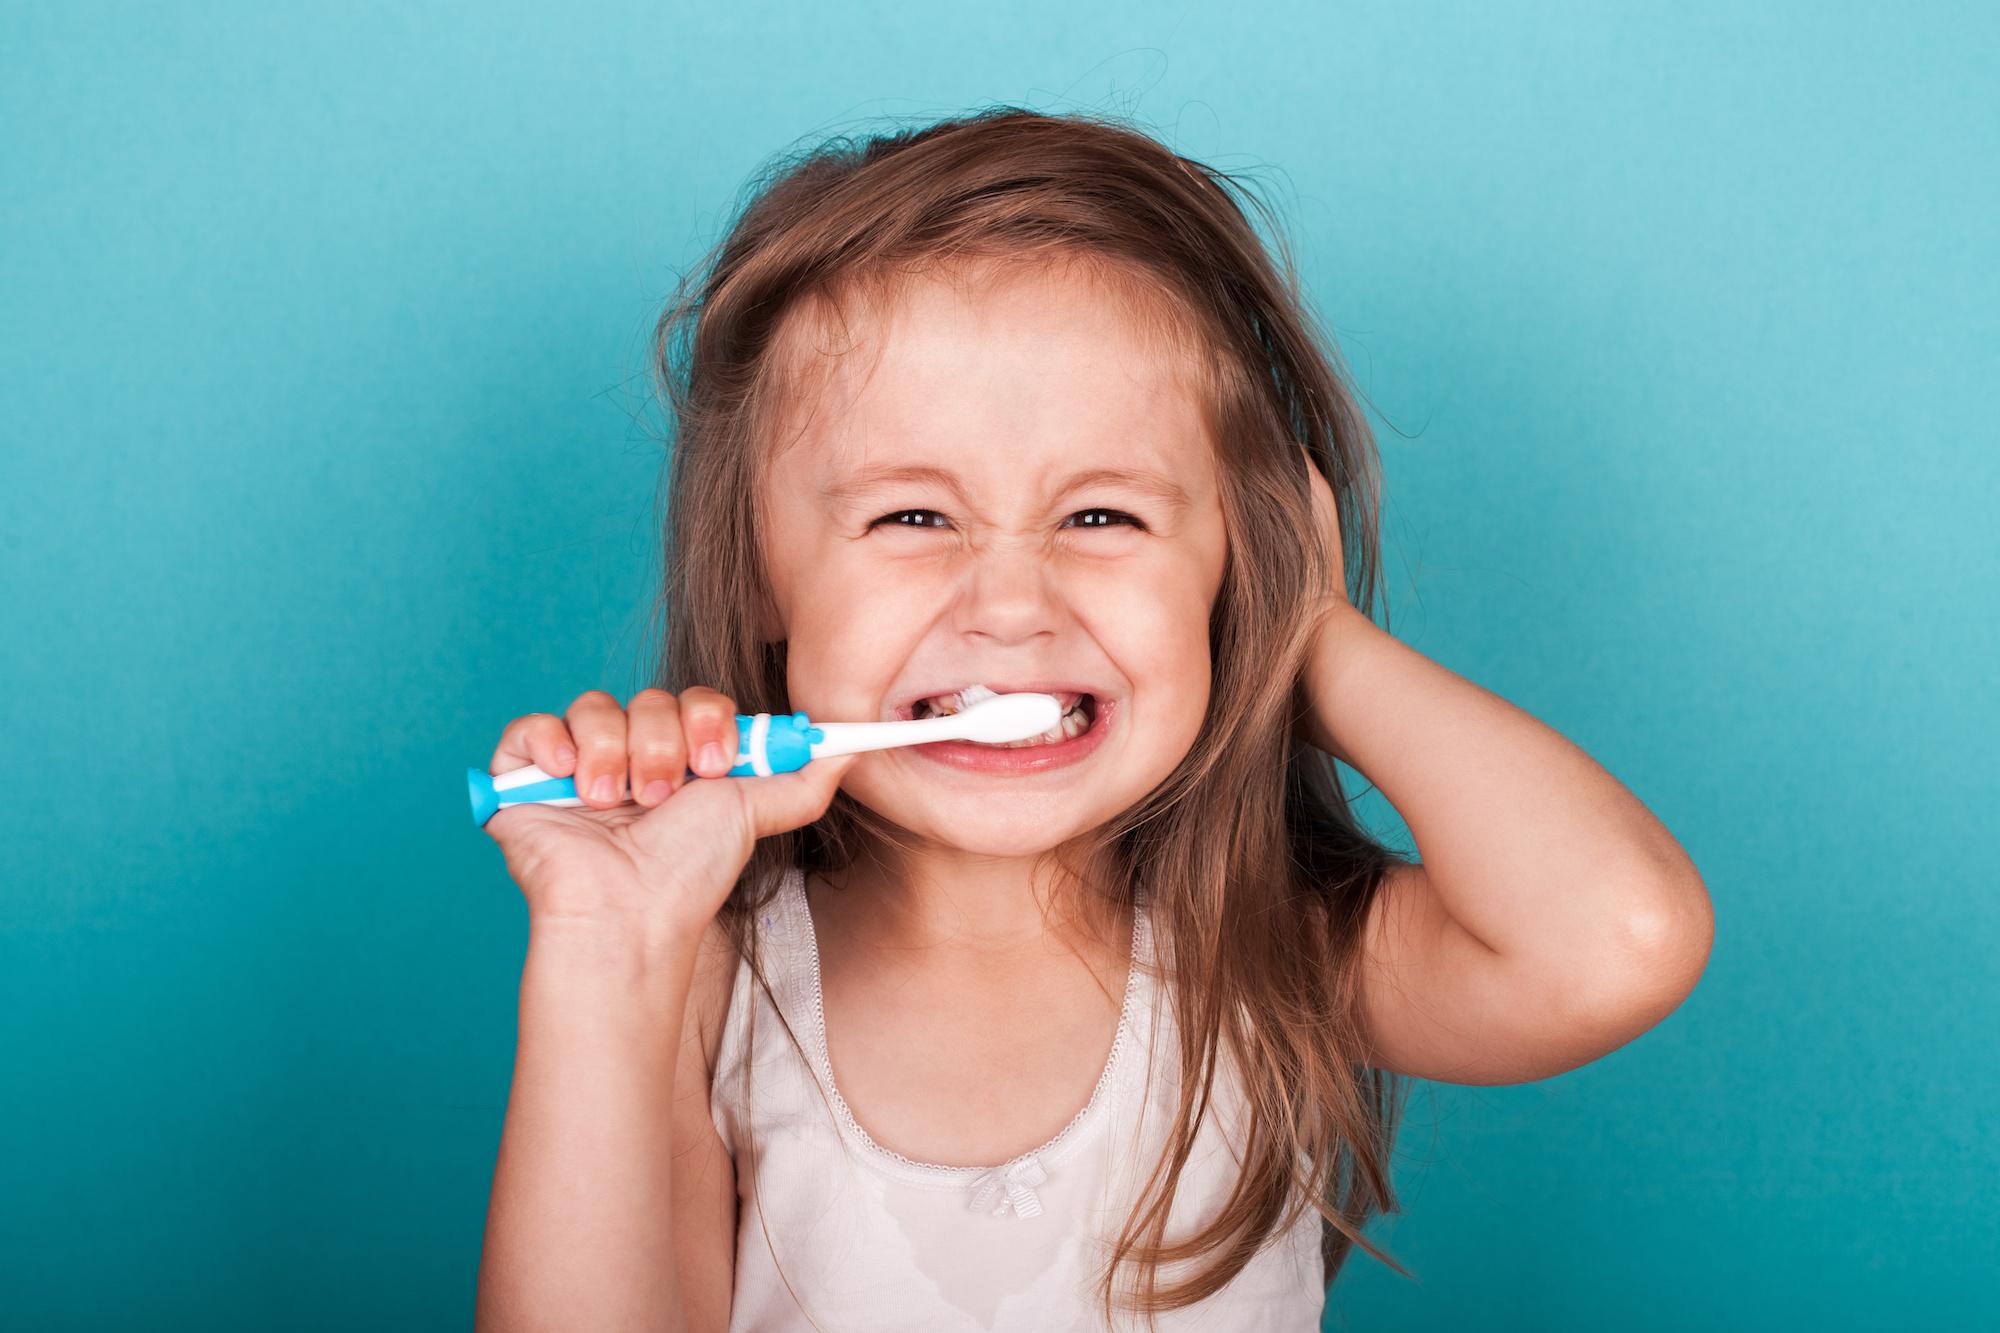 Cute little girl brushing her teeth